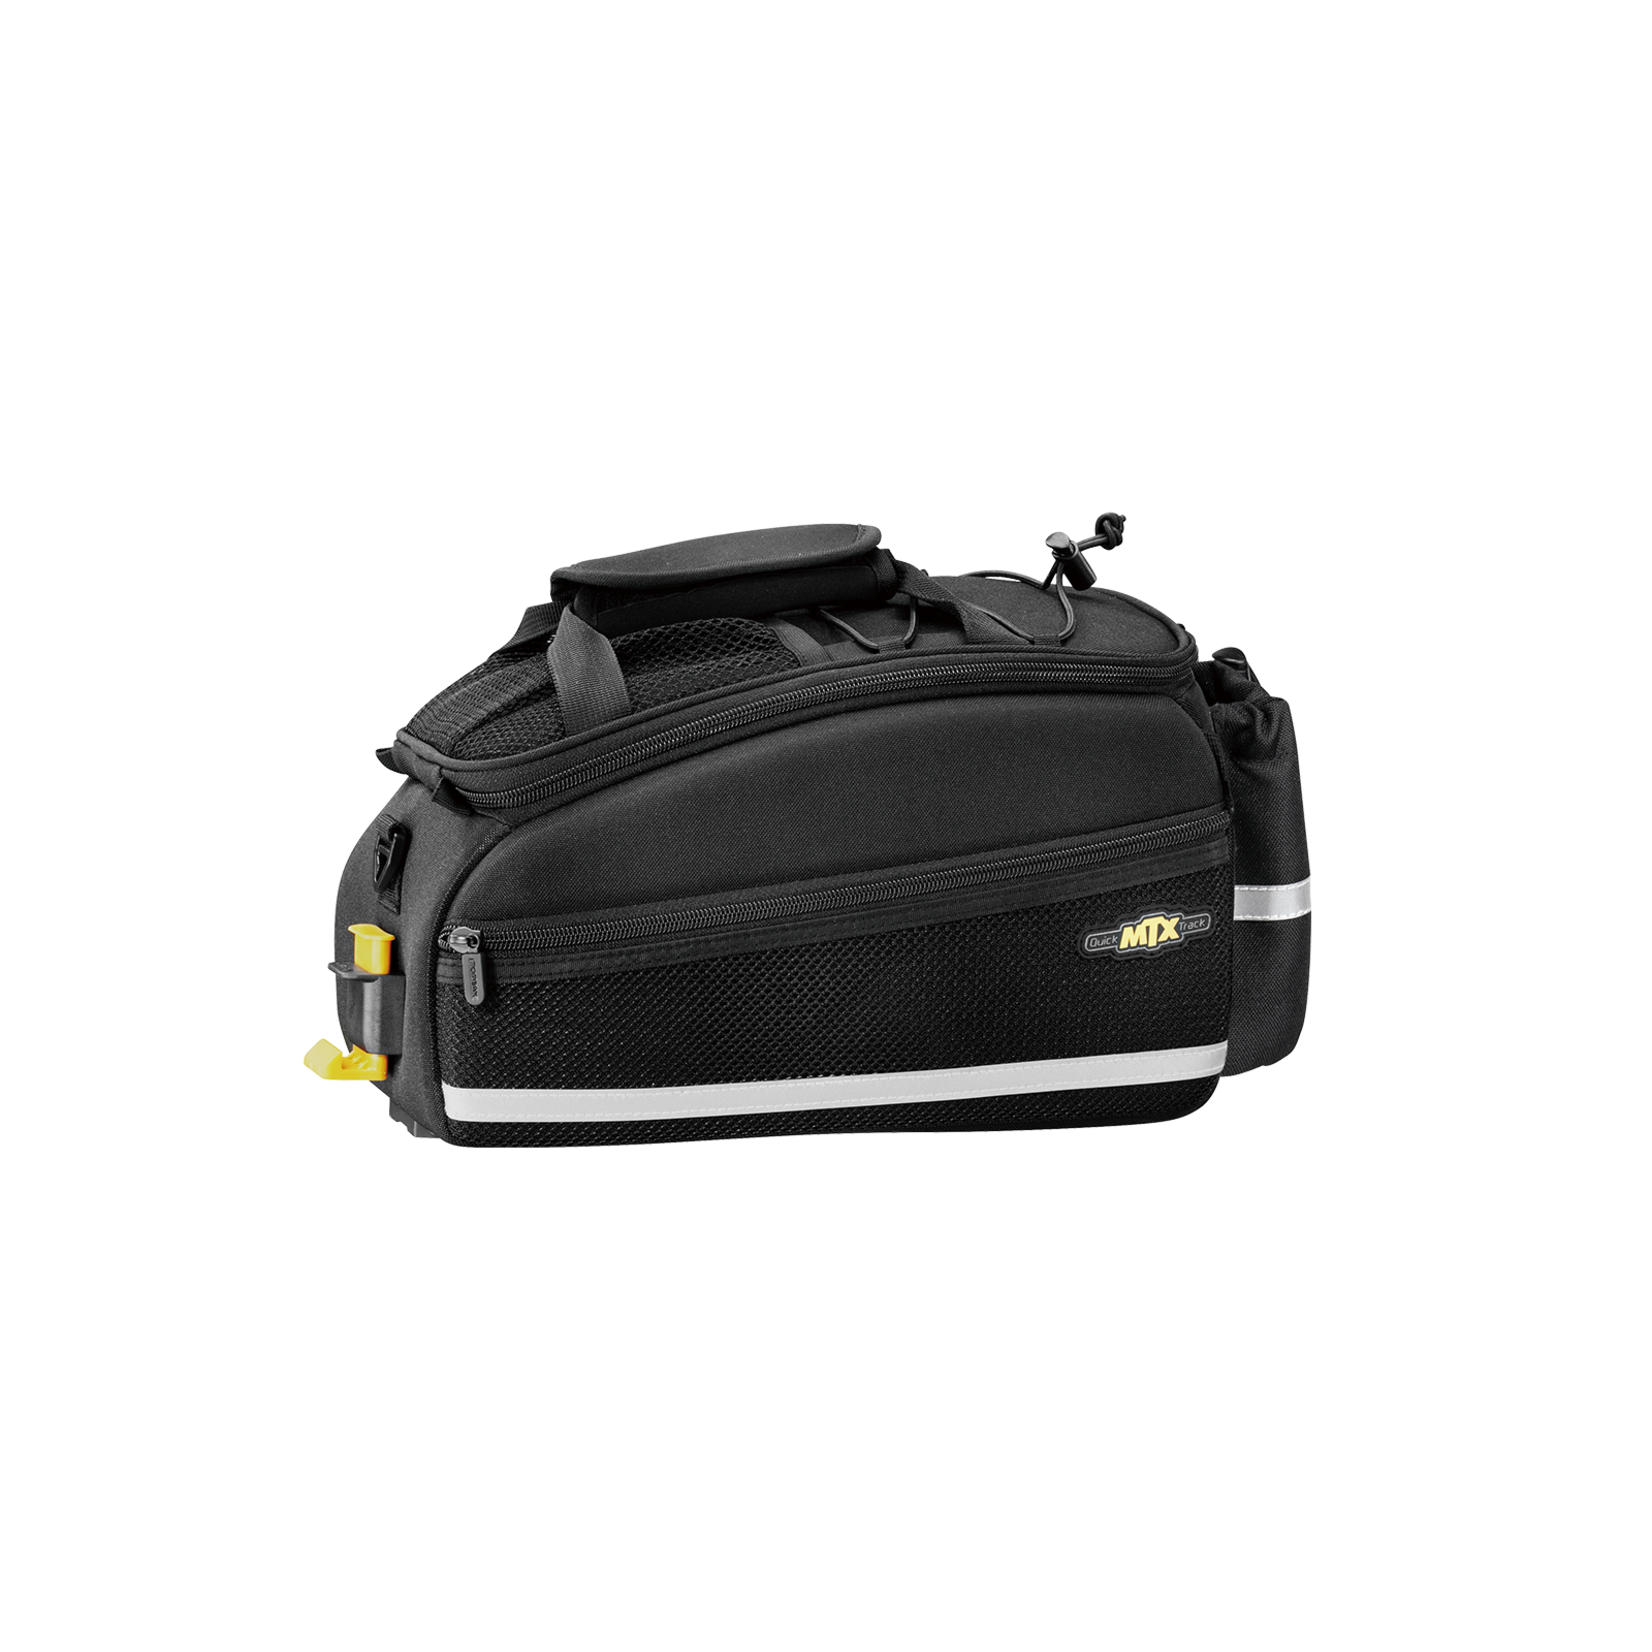 MTX Trunk Bag EX